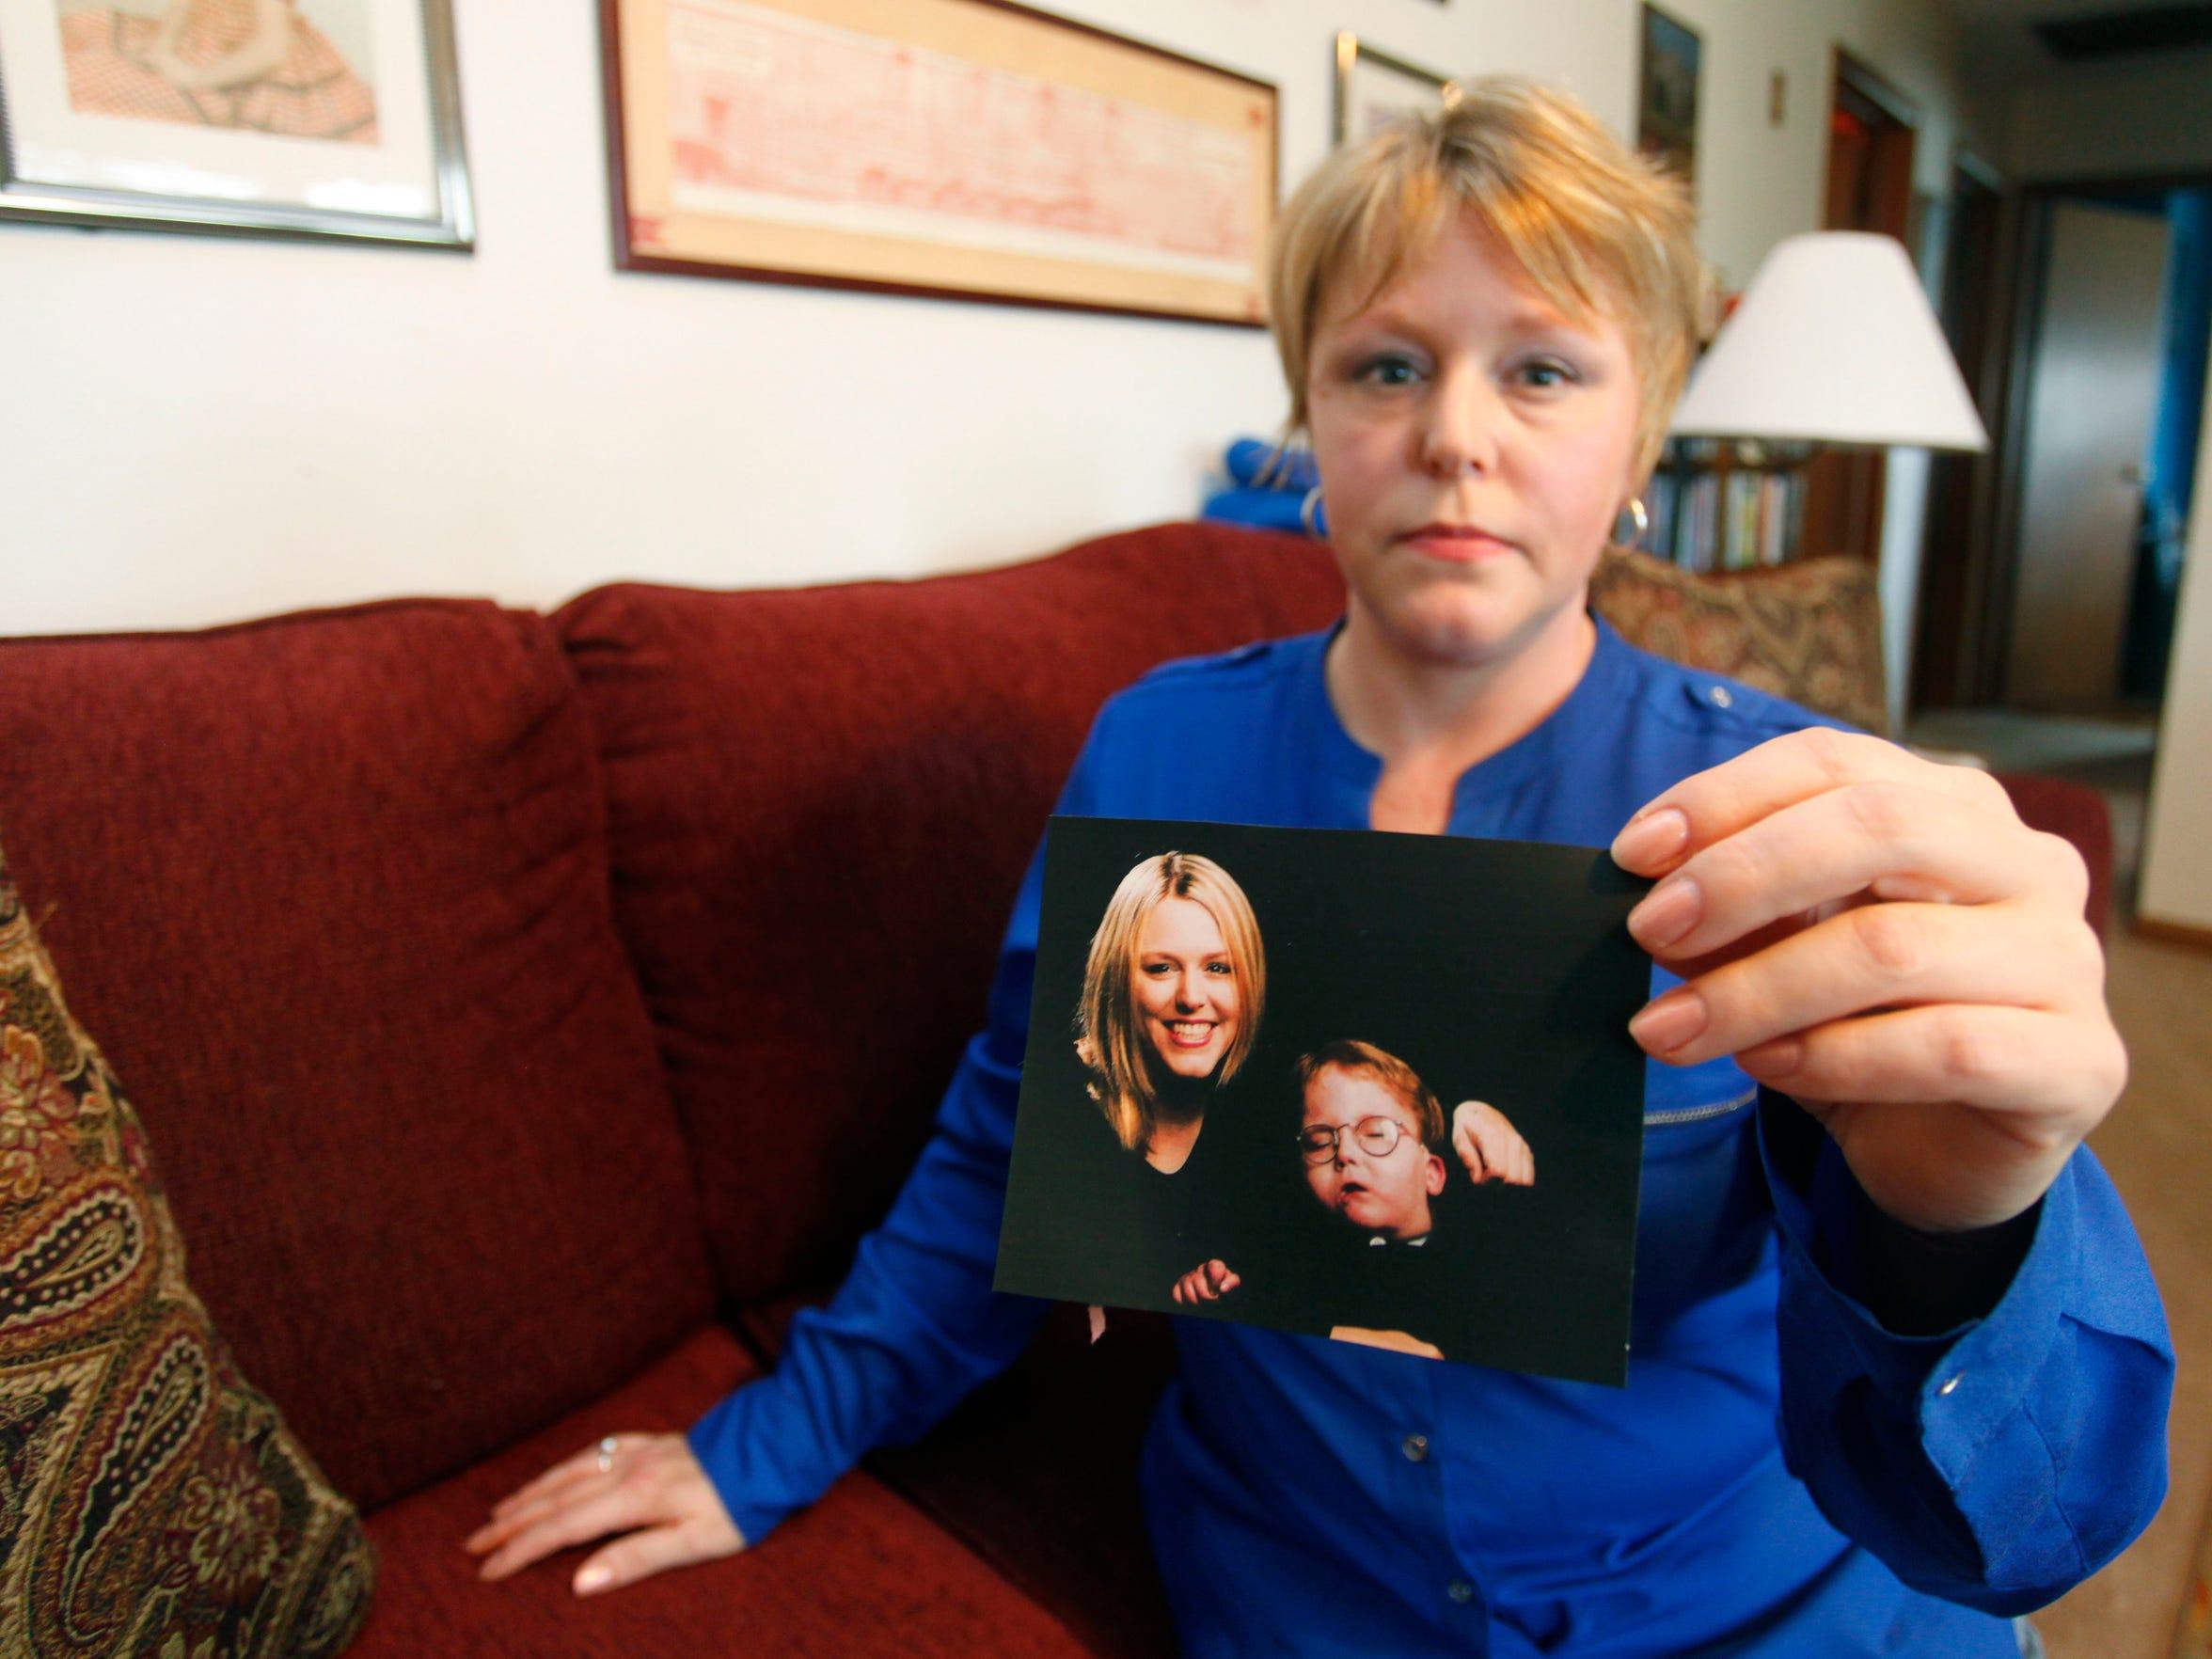 Springfield resident Renee Cook's son Devon died in